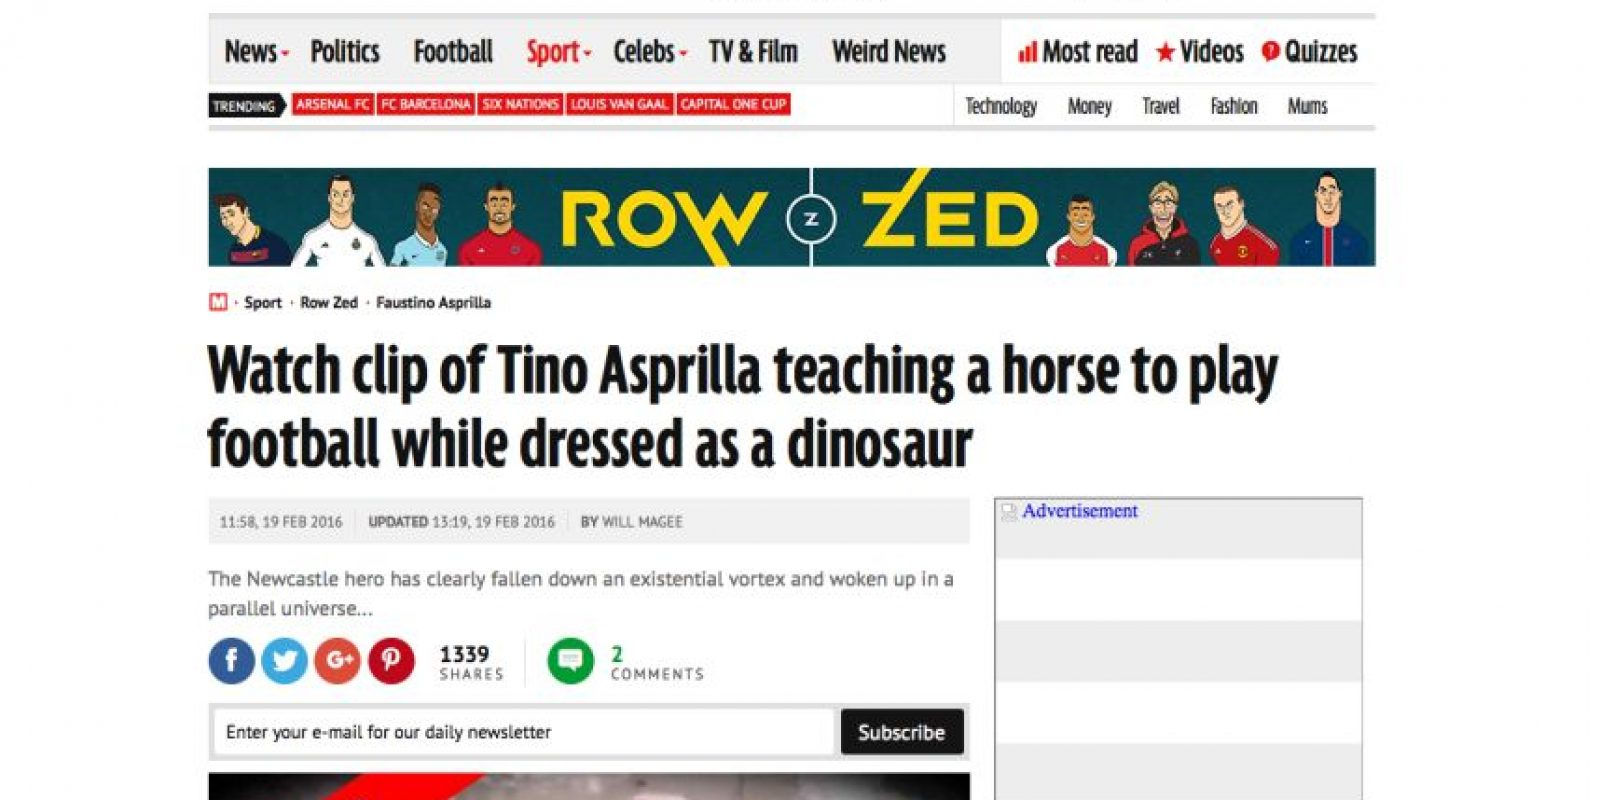 Foto:Captura de pantalla de la página www.mirror.co.uk